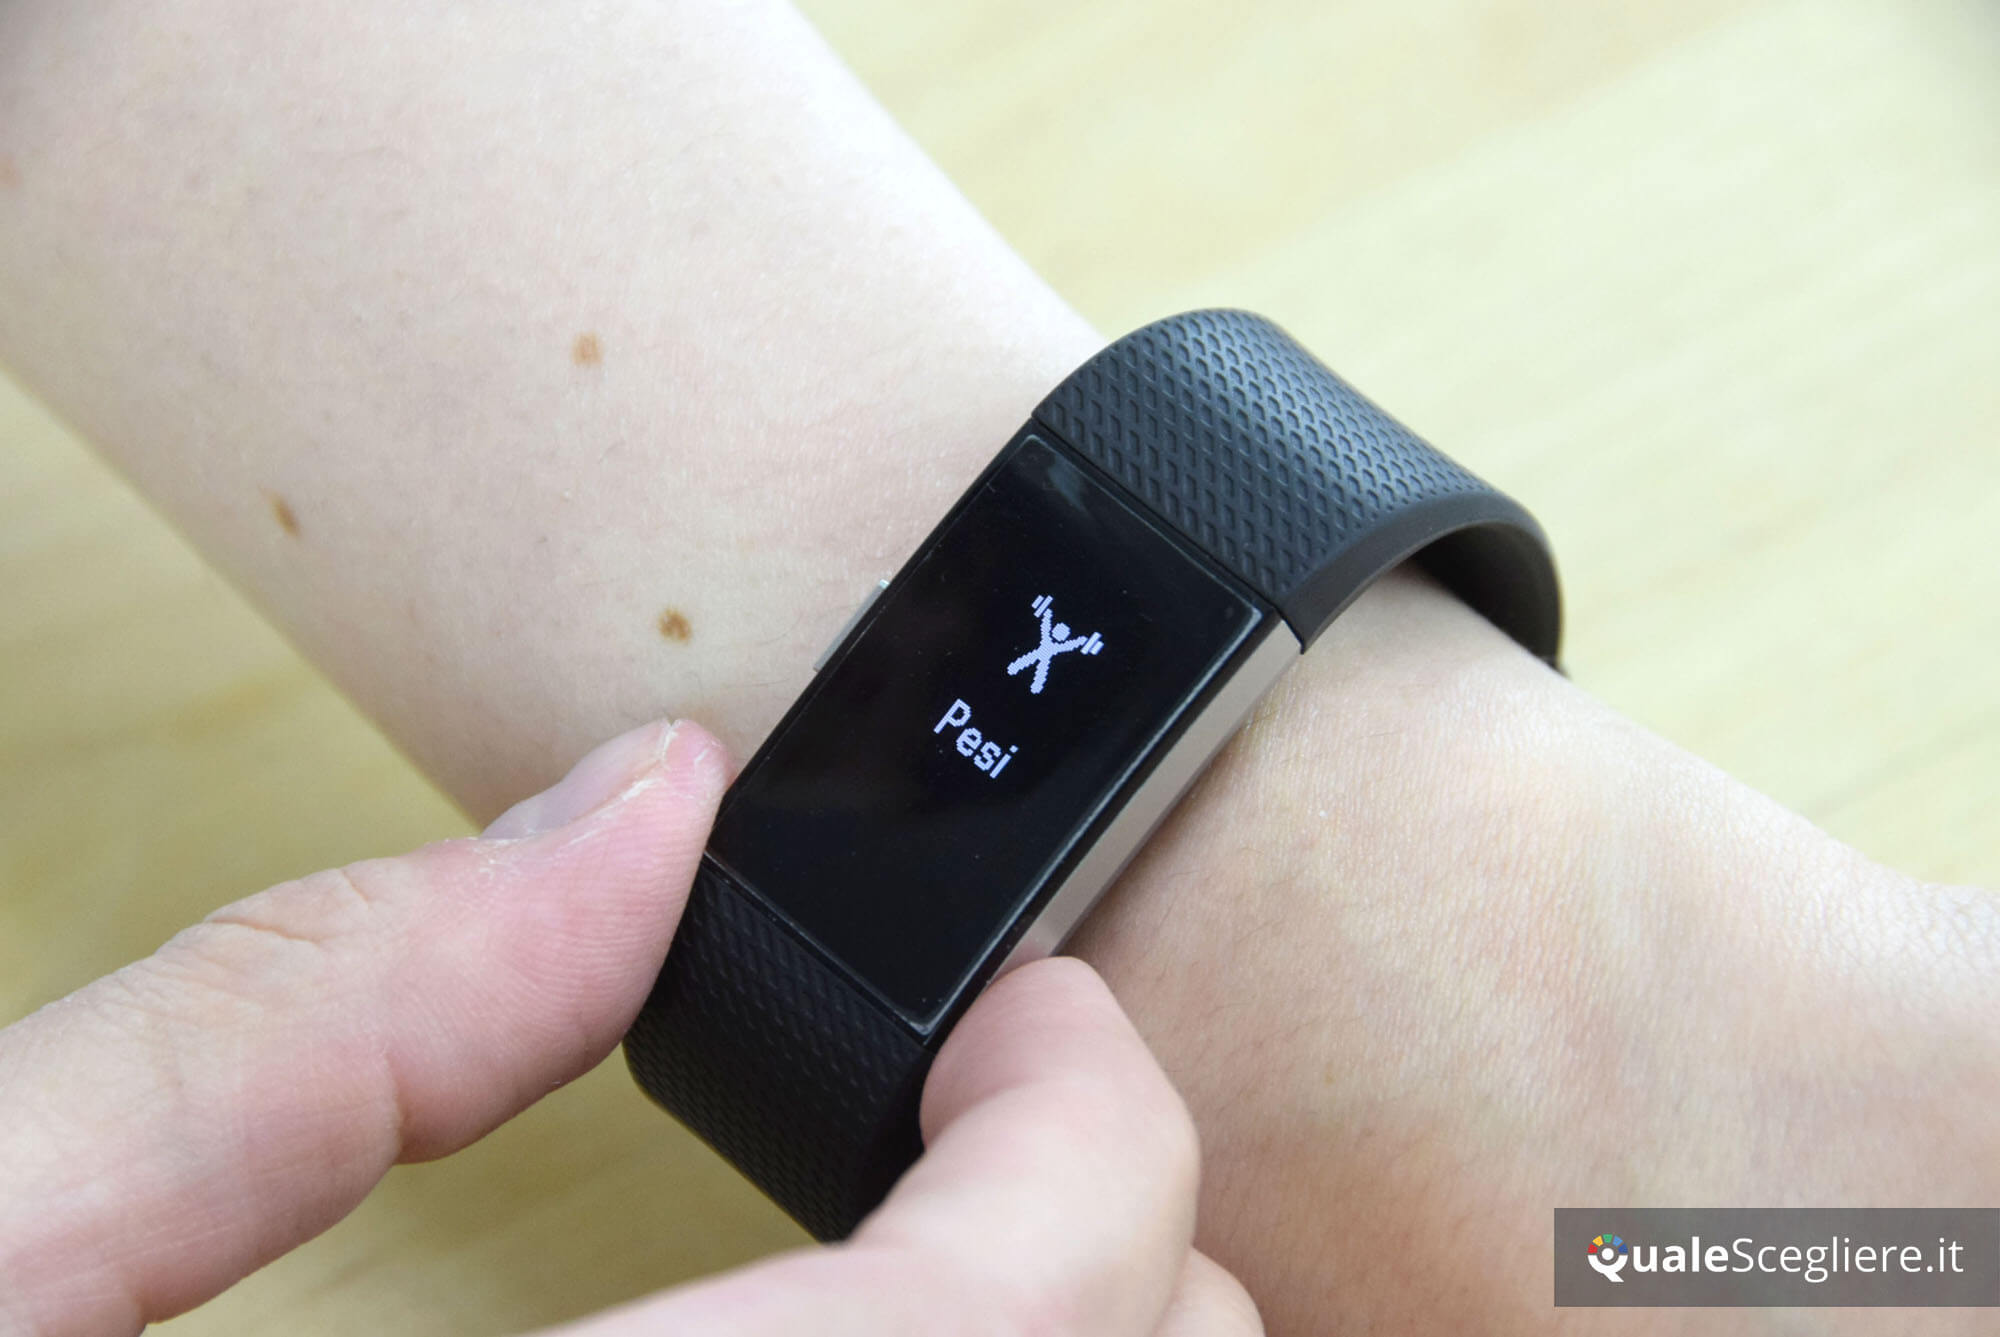 Fitbit Charge 2 pesi